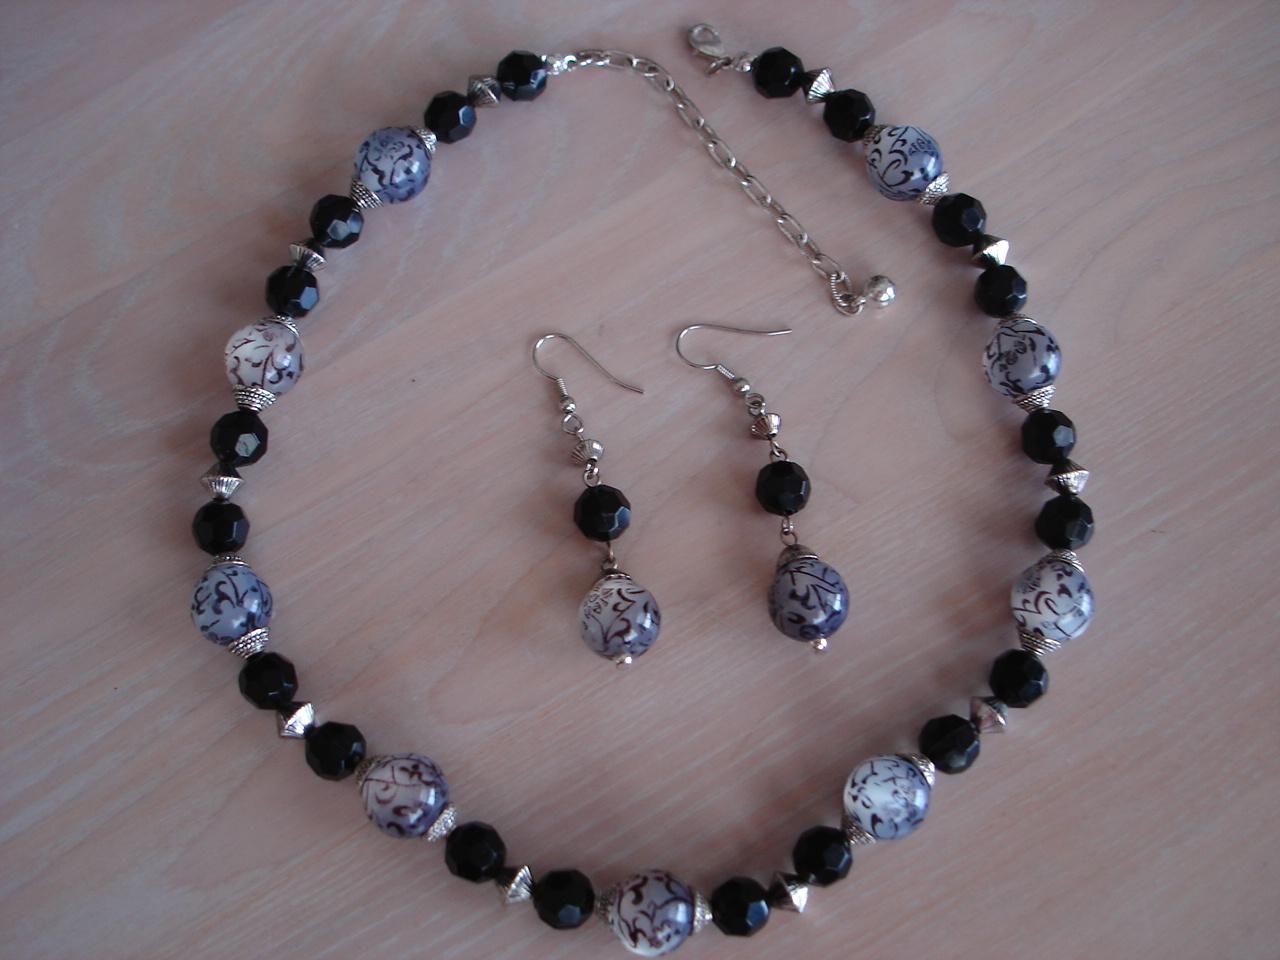 Asian Flair Black Bead Necklace & Matching Pierced Earrings Bonanza